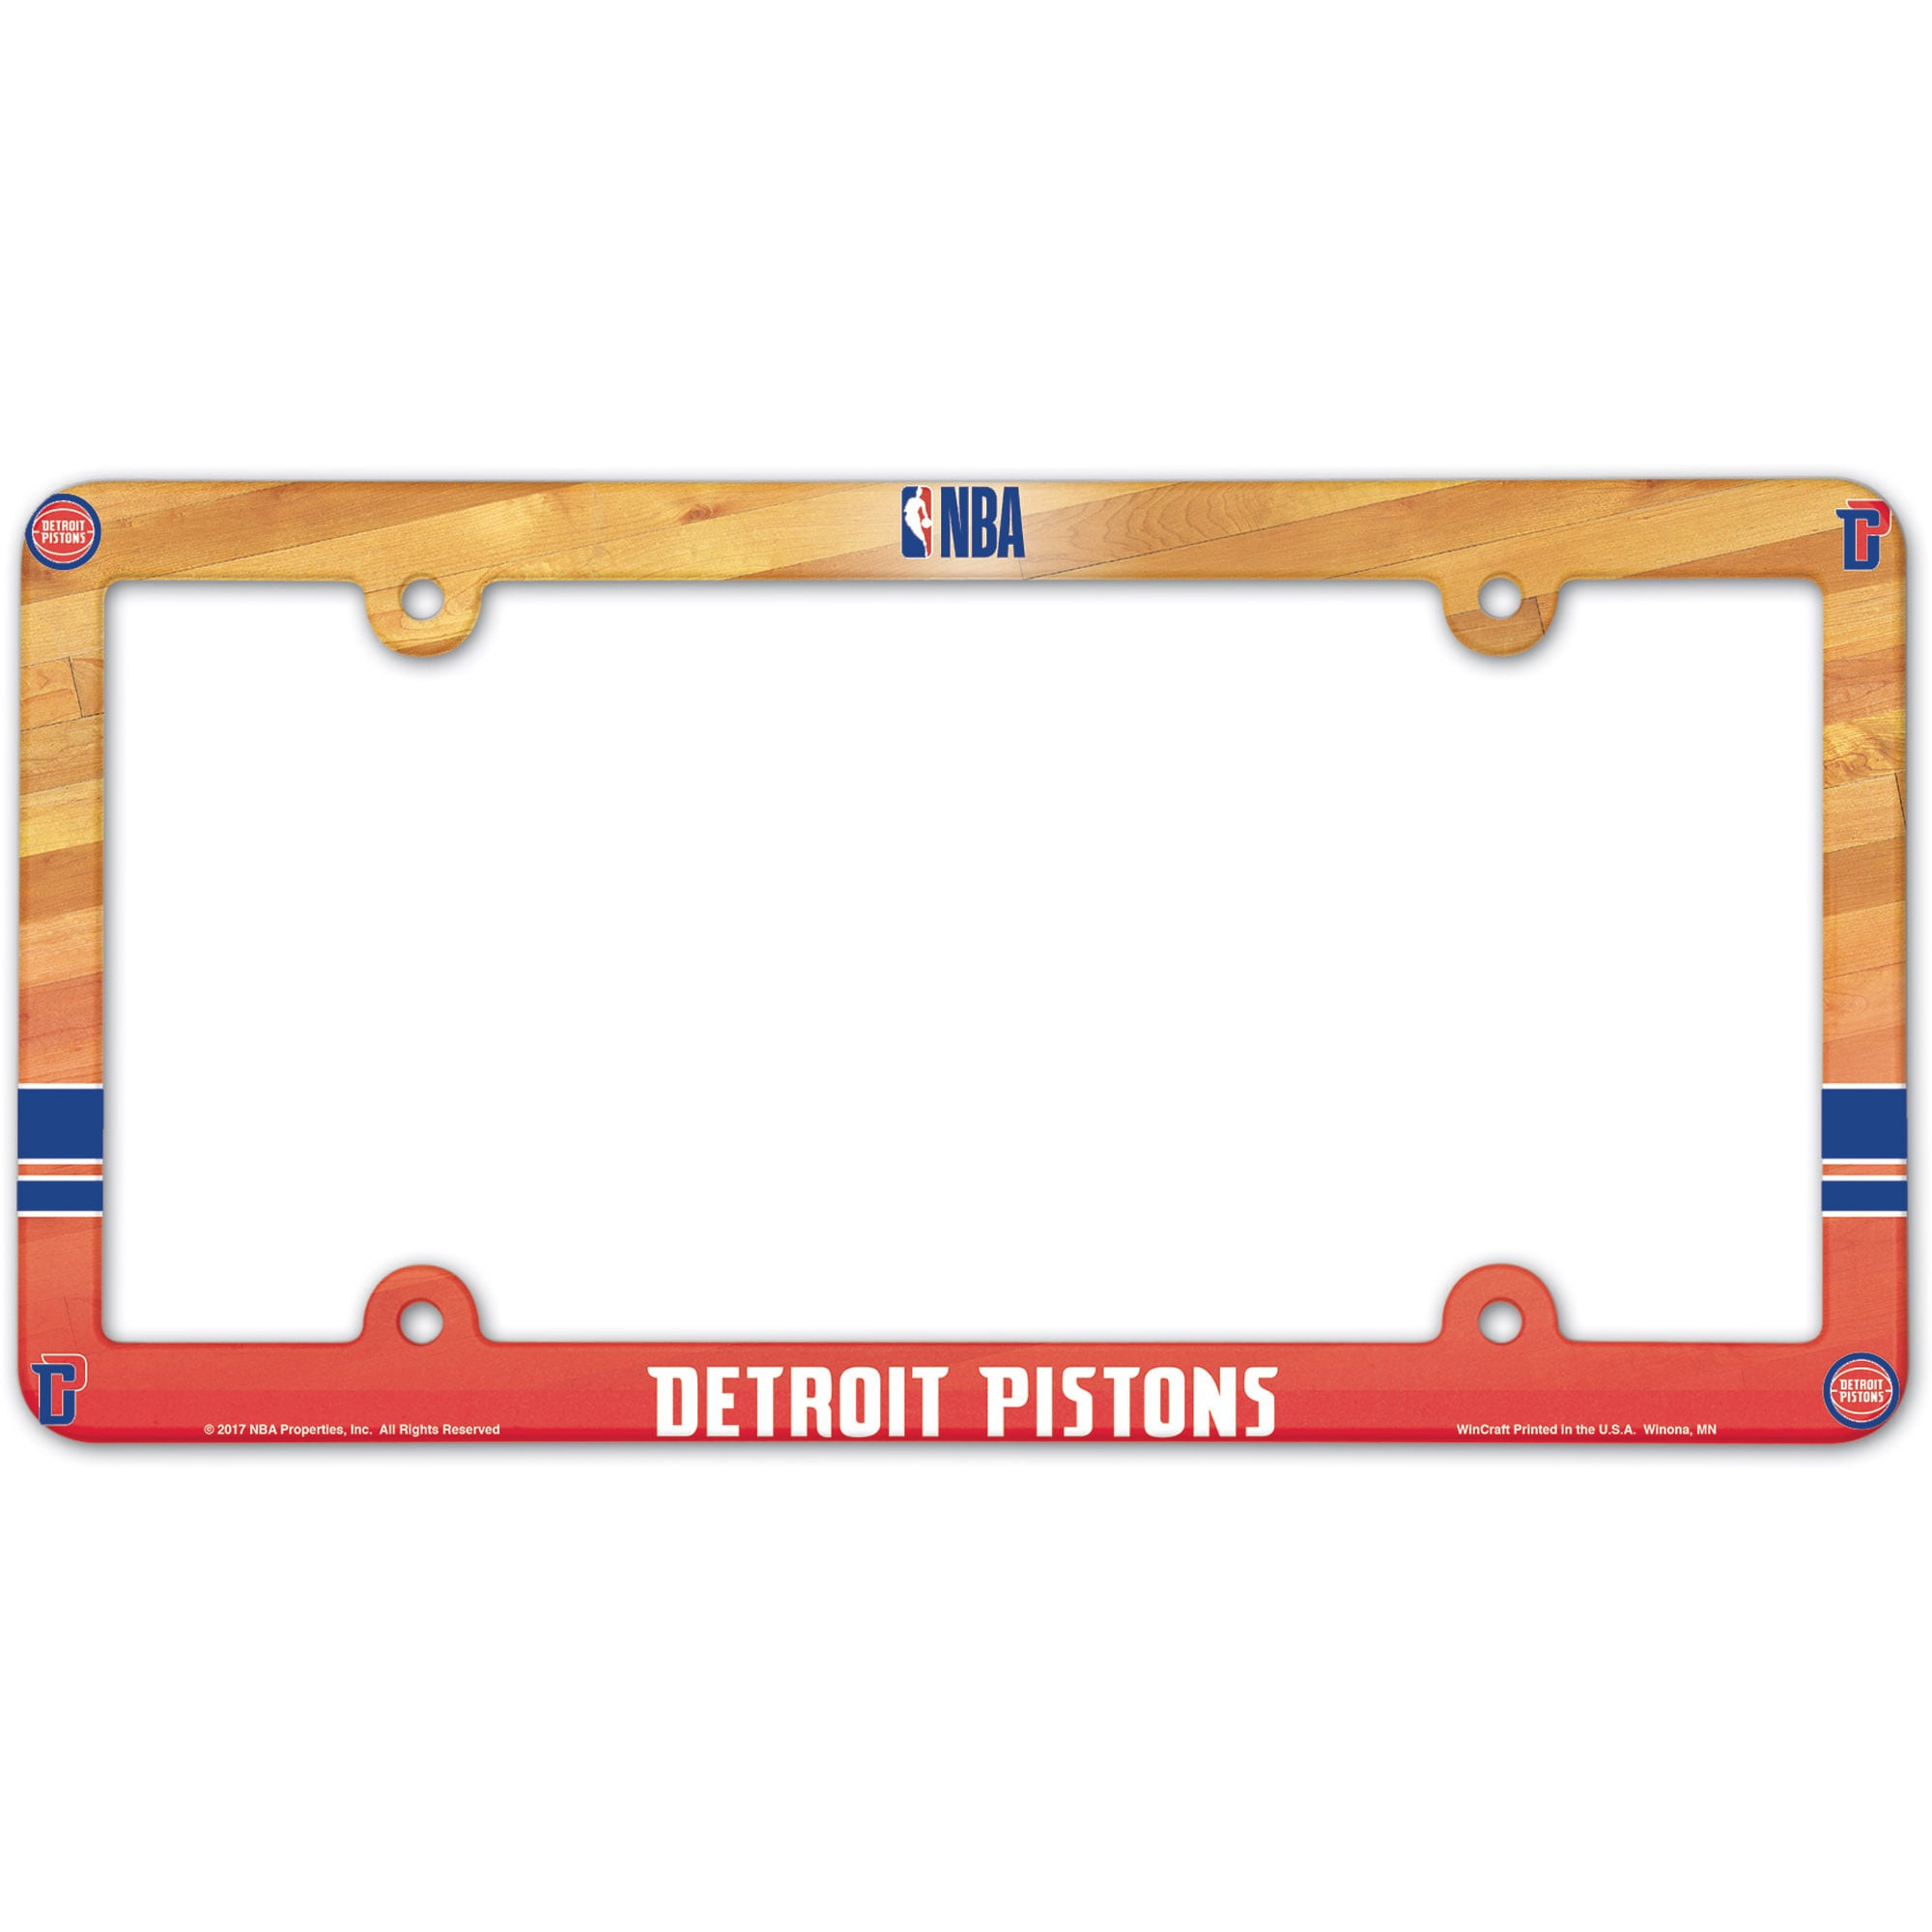 Detroit Pistons WinCraft Team License Plate Frame